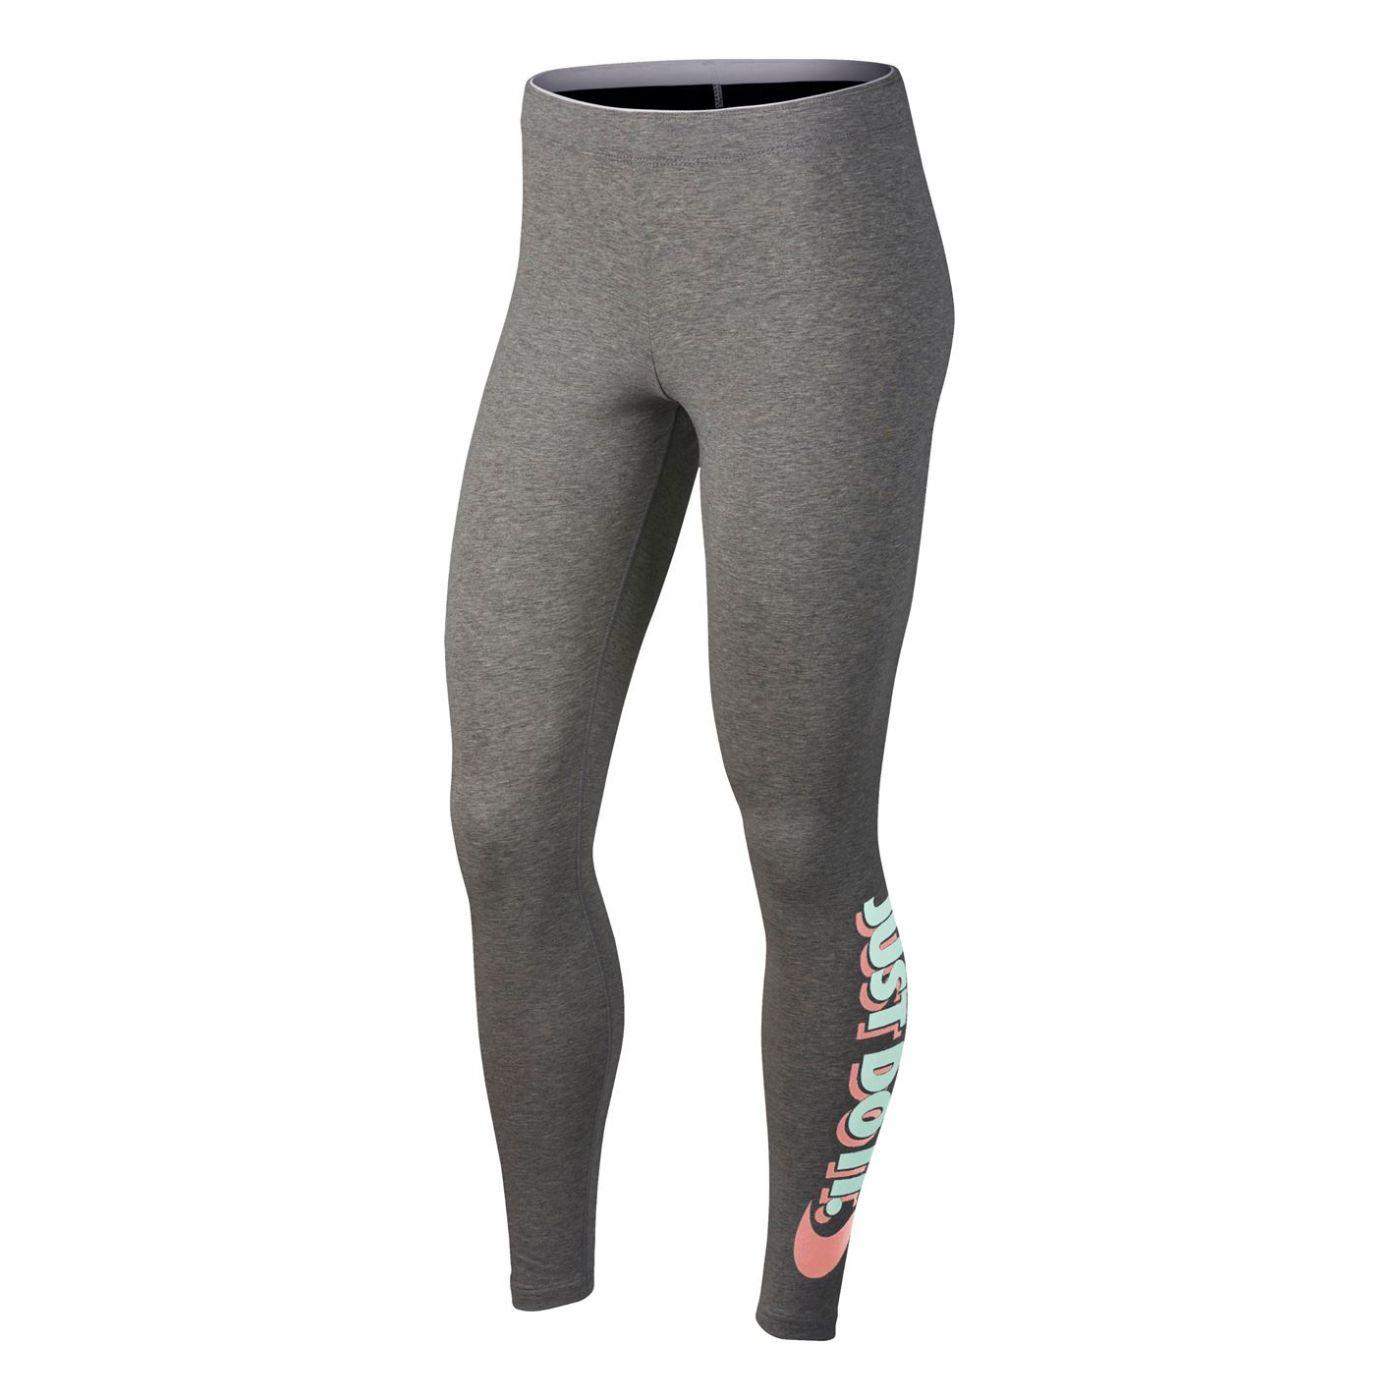 07959062f7 Nike JDI Leggings Ladies - FACTCOOL